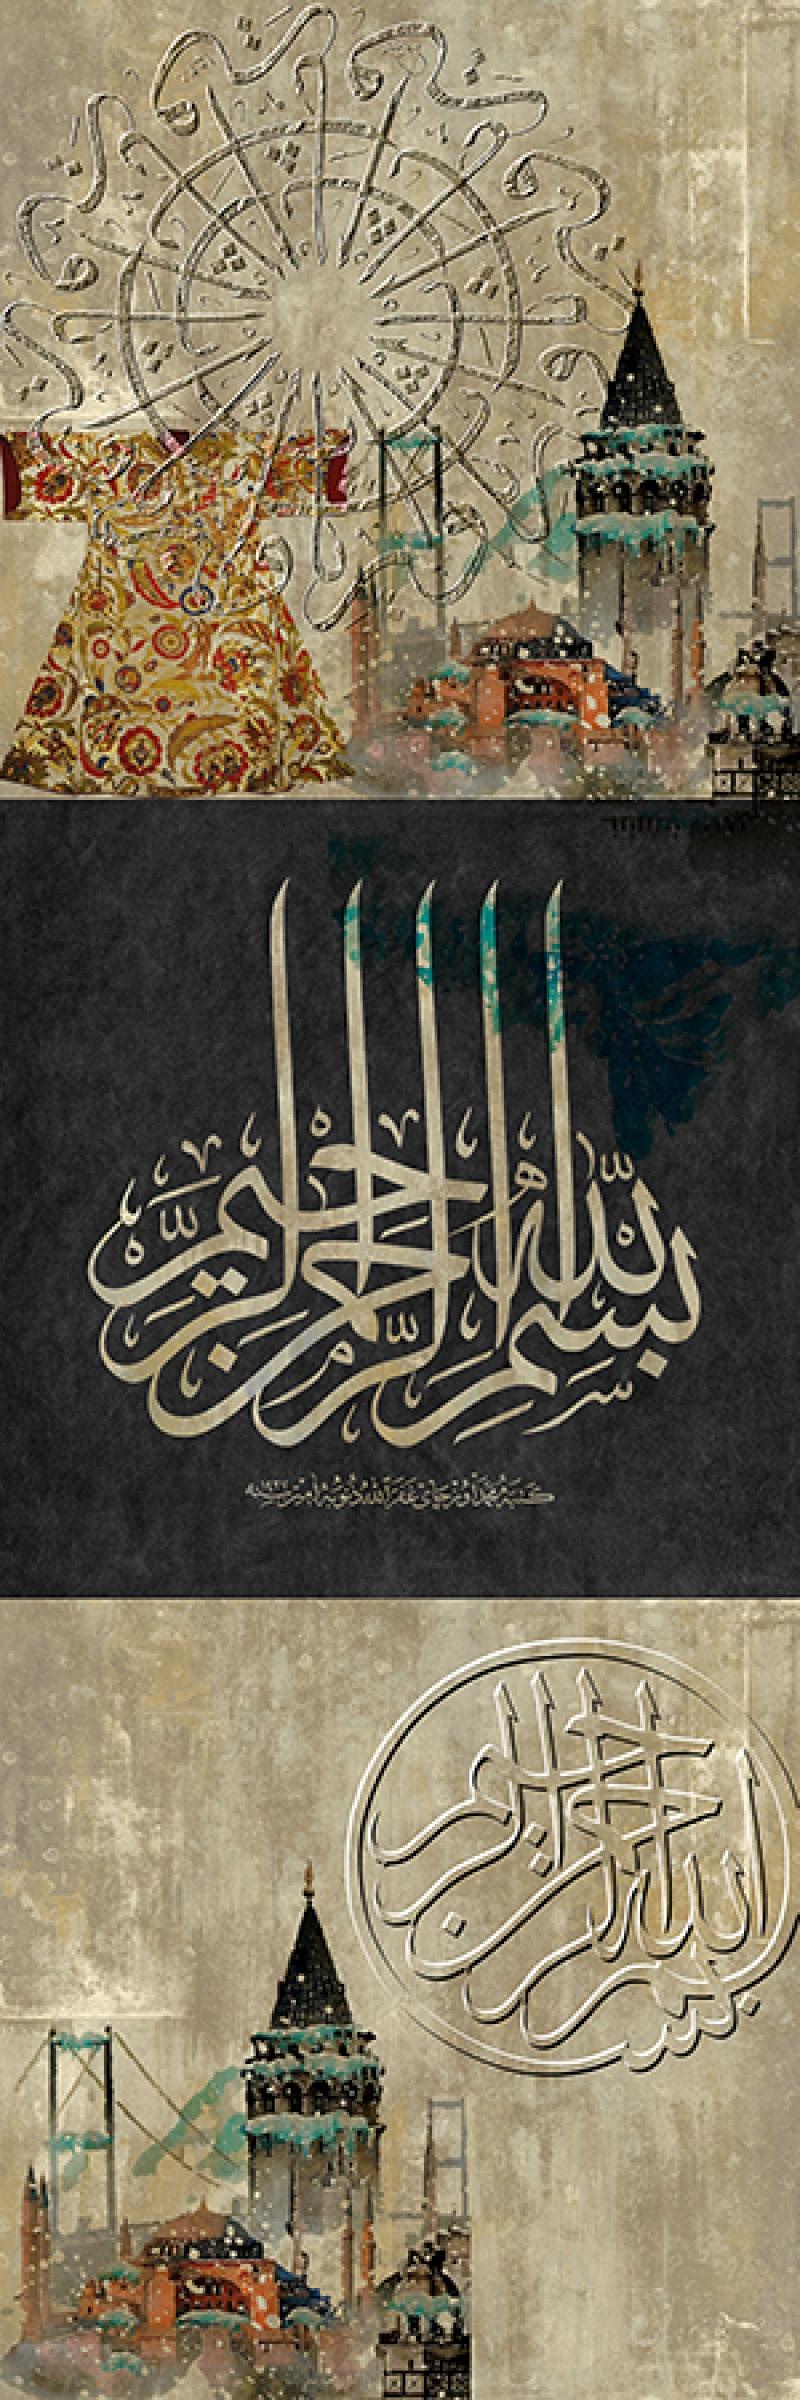 Bismillah Kaligrafi-1 Dini Temalı İslami Tablolar